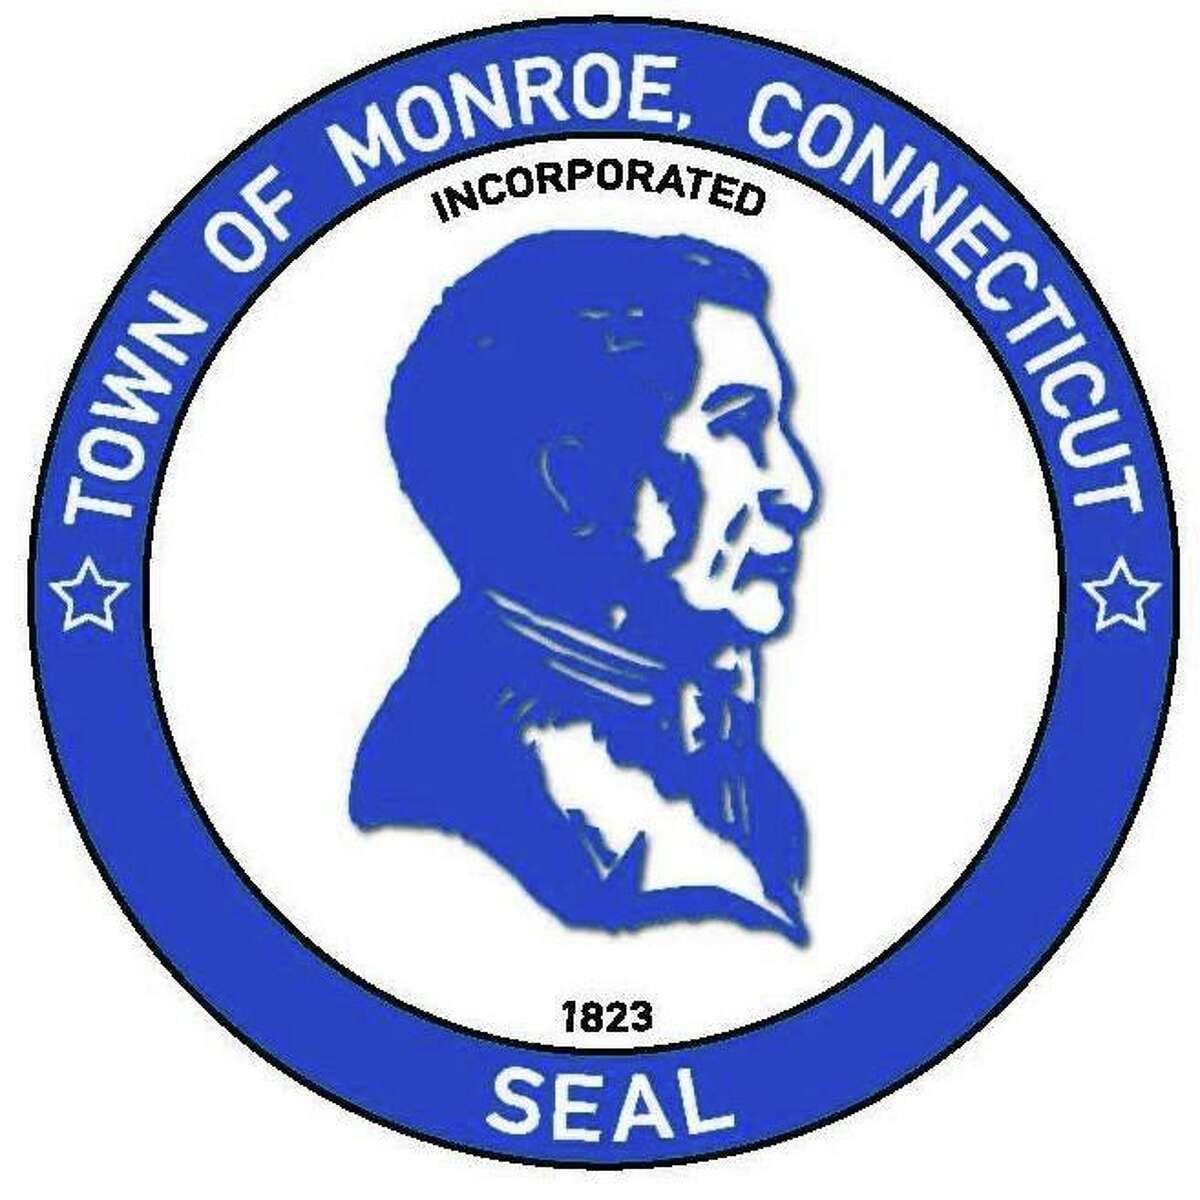 Town of Monroe.